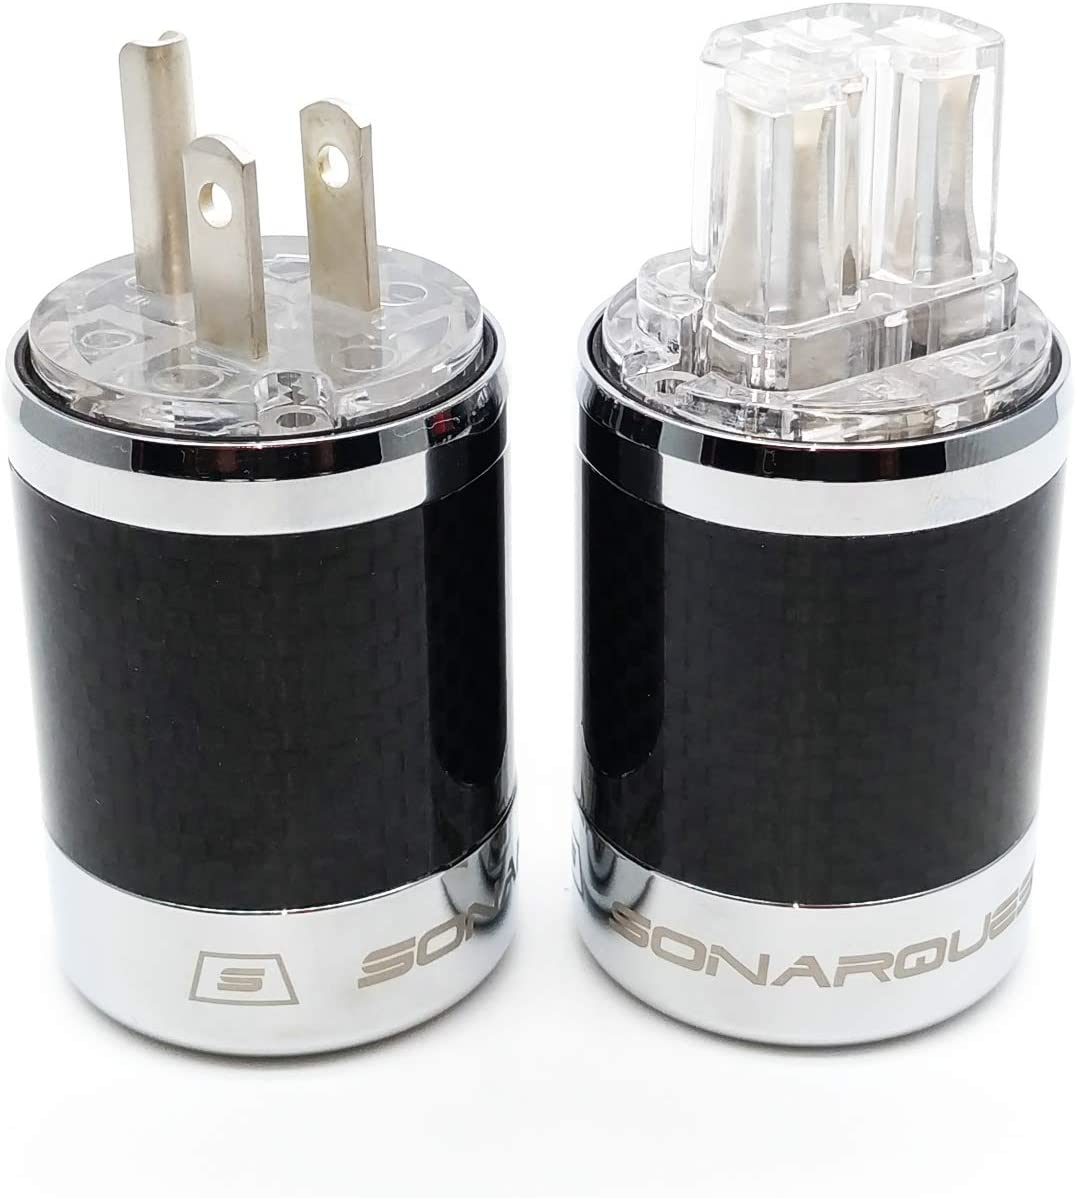 T AG AG T+SQ-C29 IEC Carbon Fiber Metal Chassis Connector Transparent SQ-P29 SONARQUEST Silver Plated US Power Plug